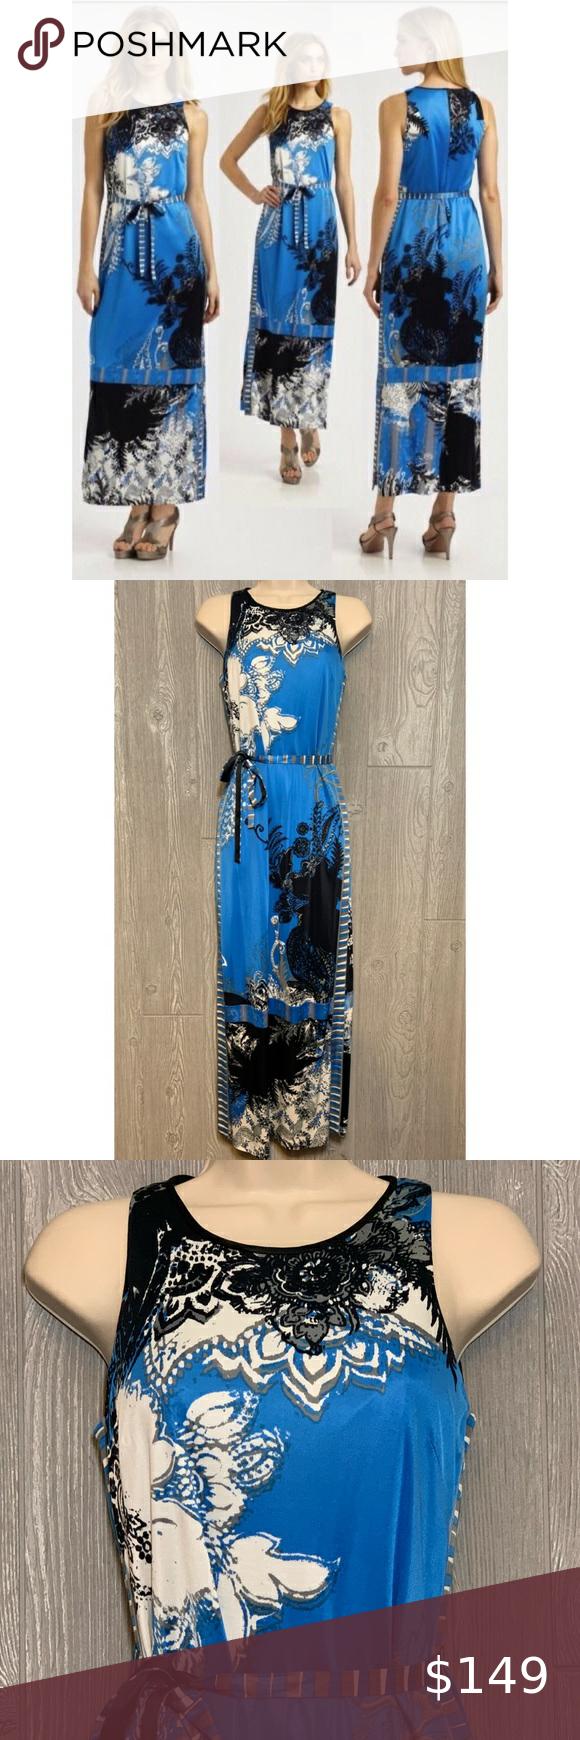 Elie Tahari Beatrice Delta Blue Maxi Dress Xs Nwt Maxi Dress Blue Elie Tahari Blue Maxi [ 1740 x 580 Pixel ]